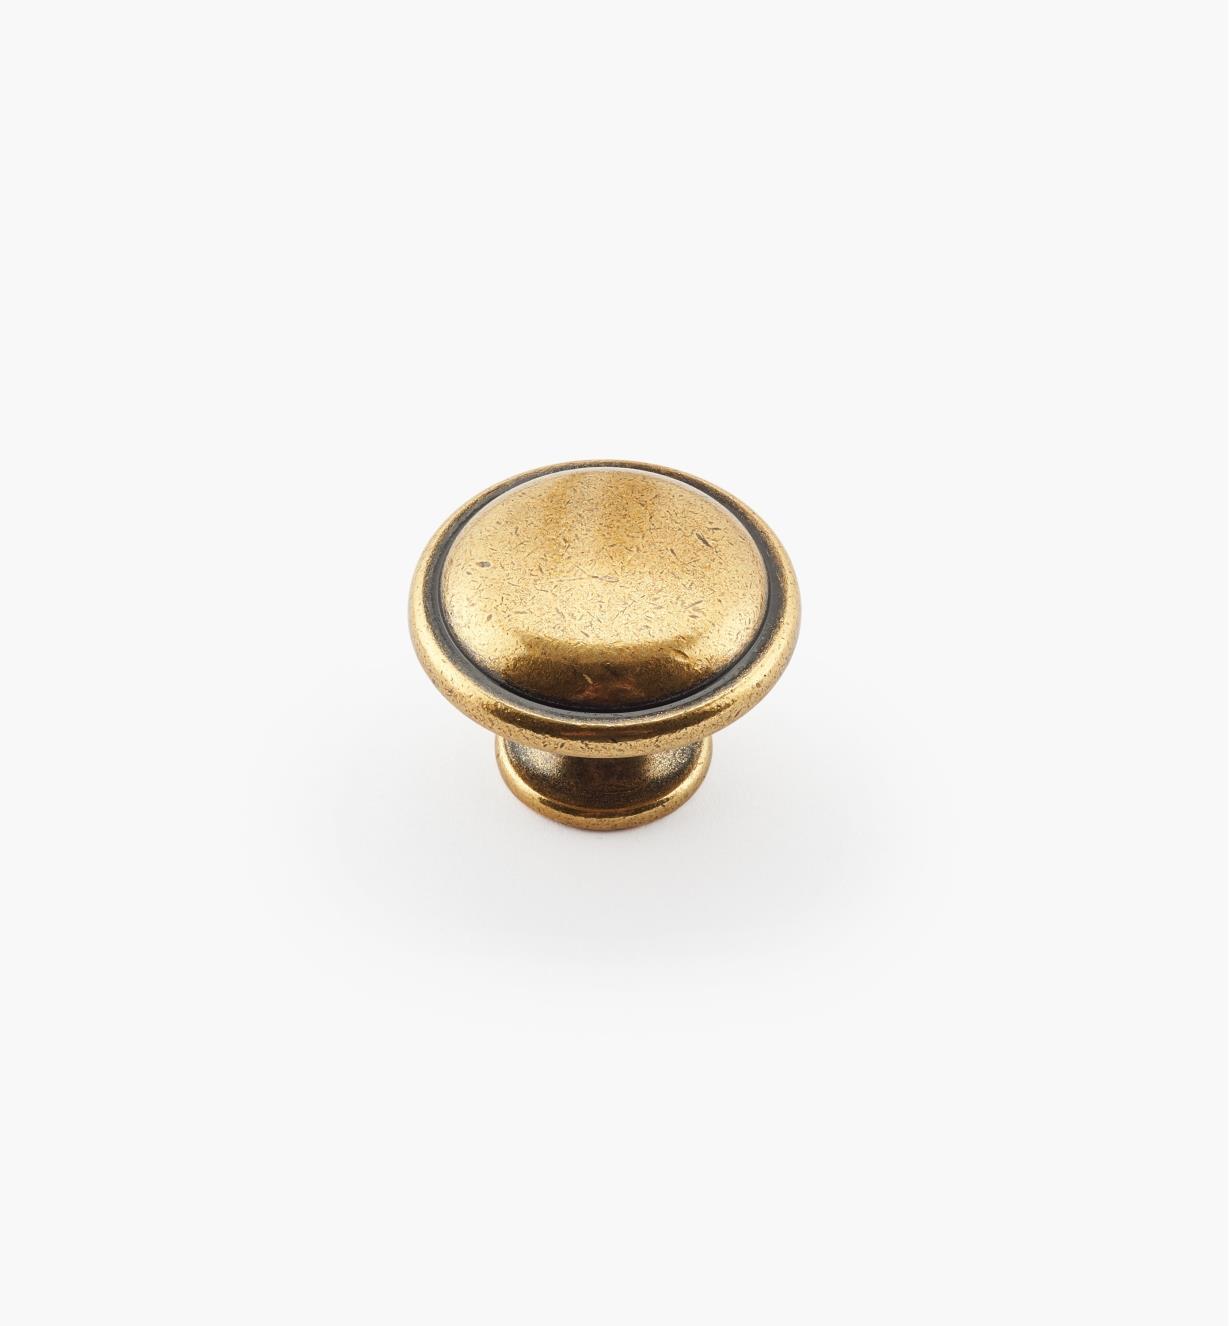 01A2075 - Bouton de 30 mm x 22 mm, sérieContemporaineII, finibronzebruni